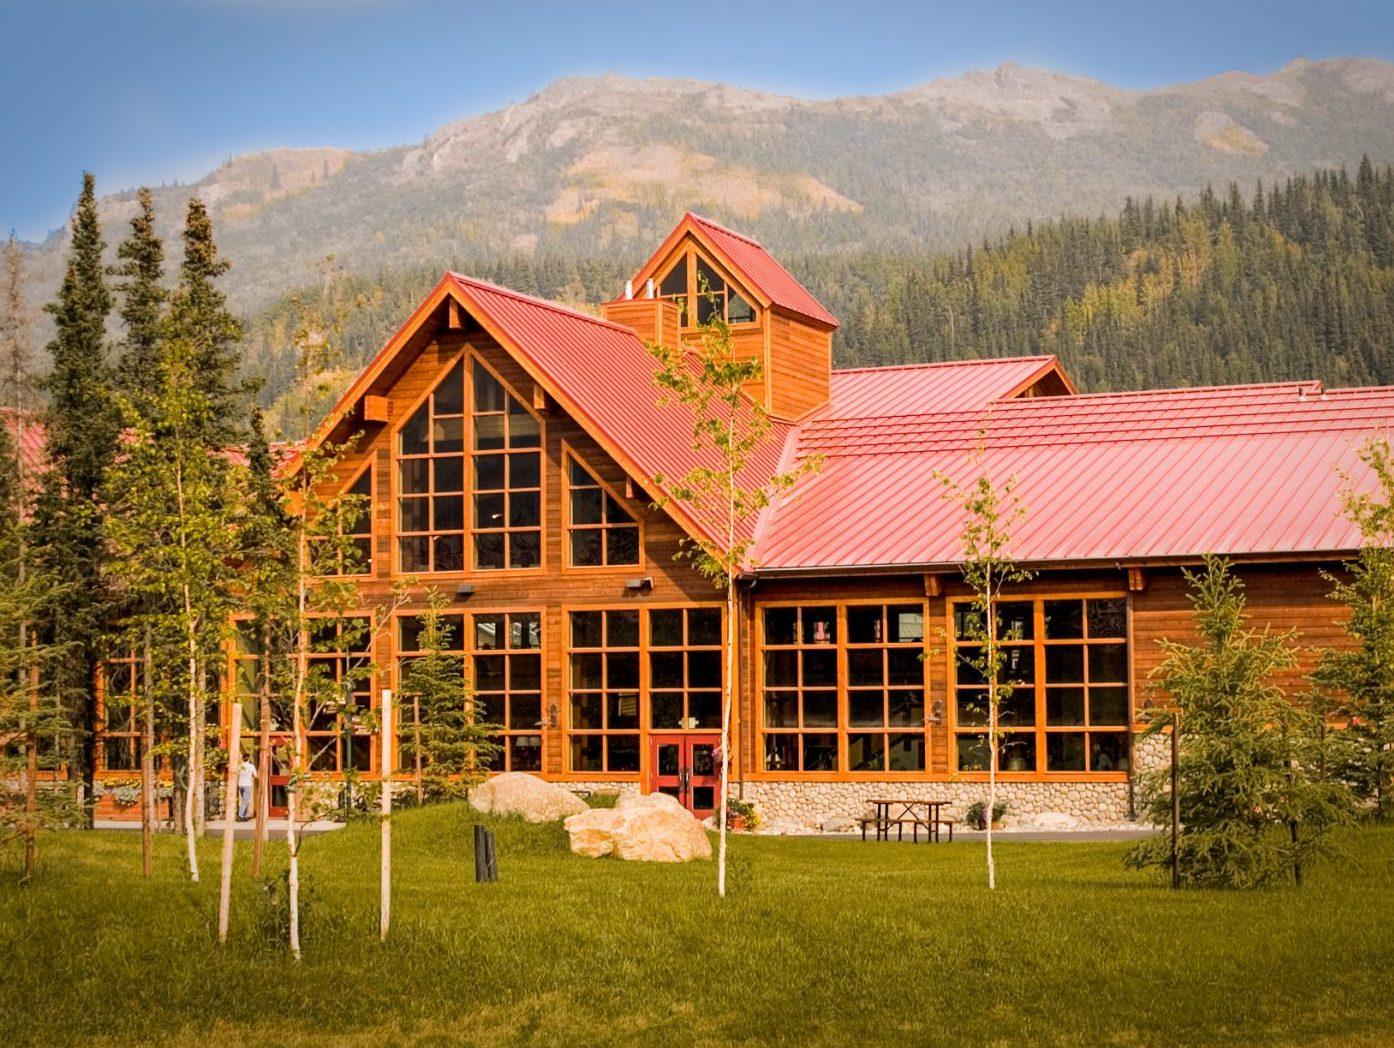 HAP Denali Princess Wilderness Lodge1